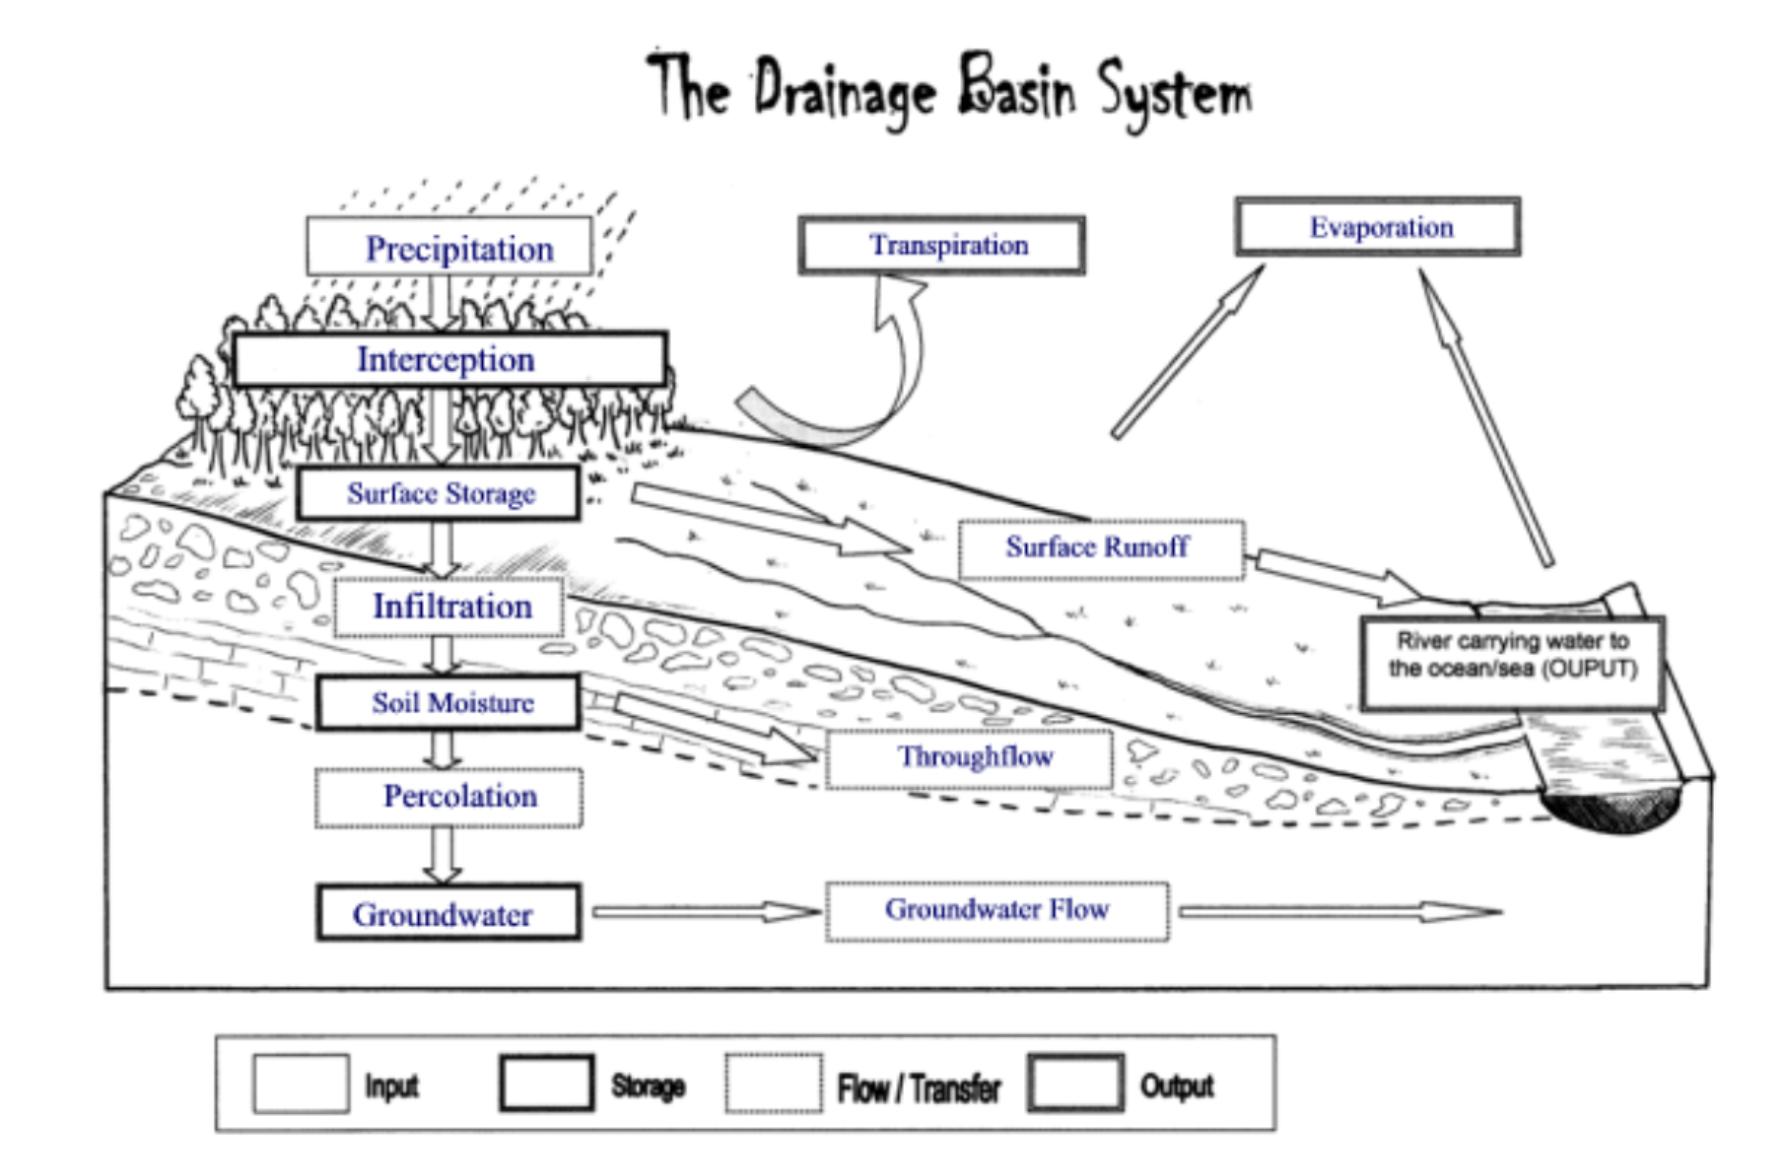 drainage basin divide water flow diagram